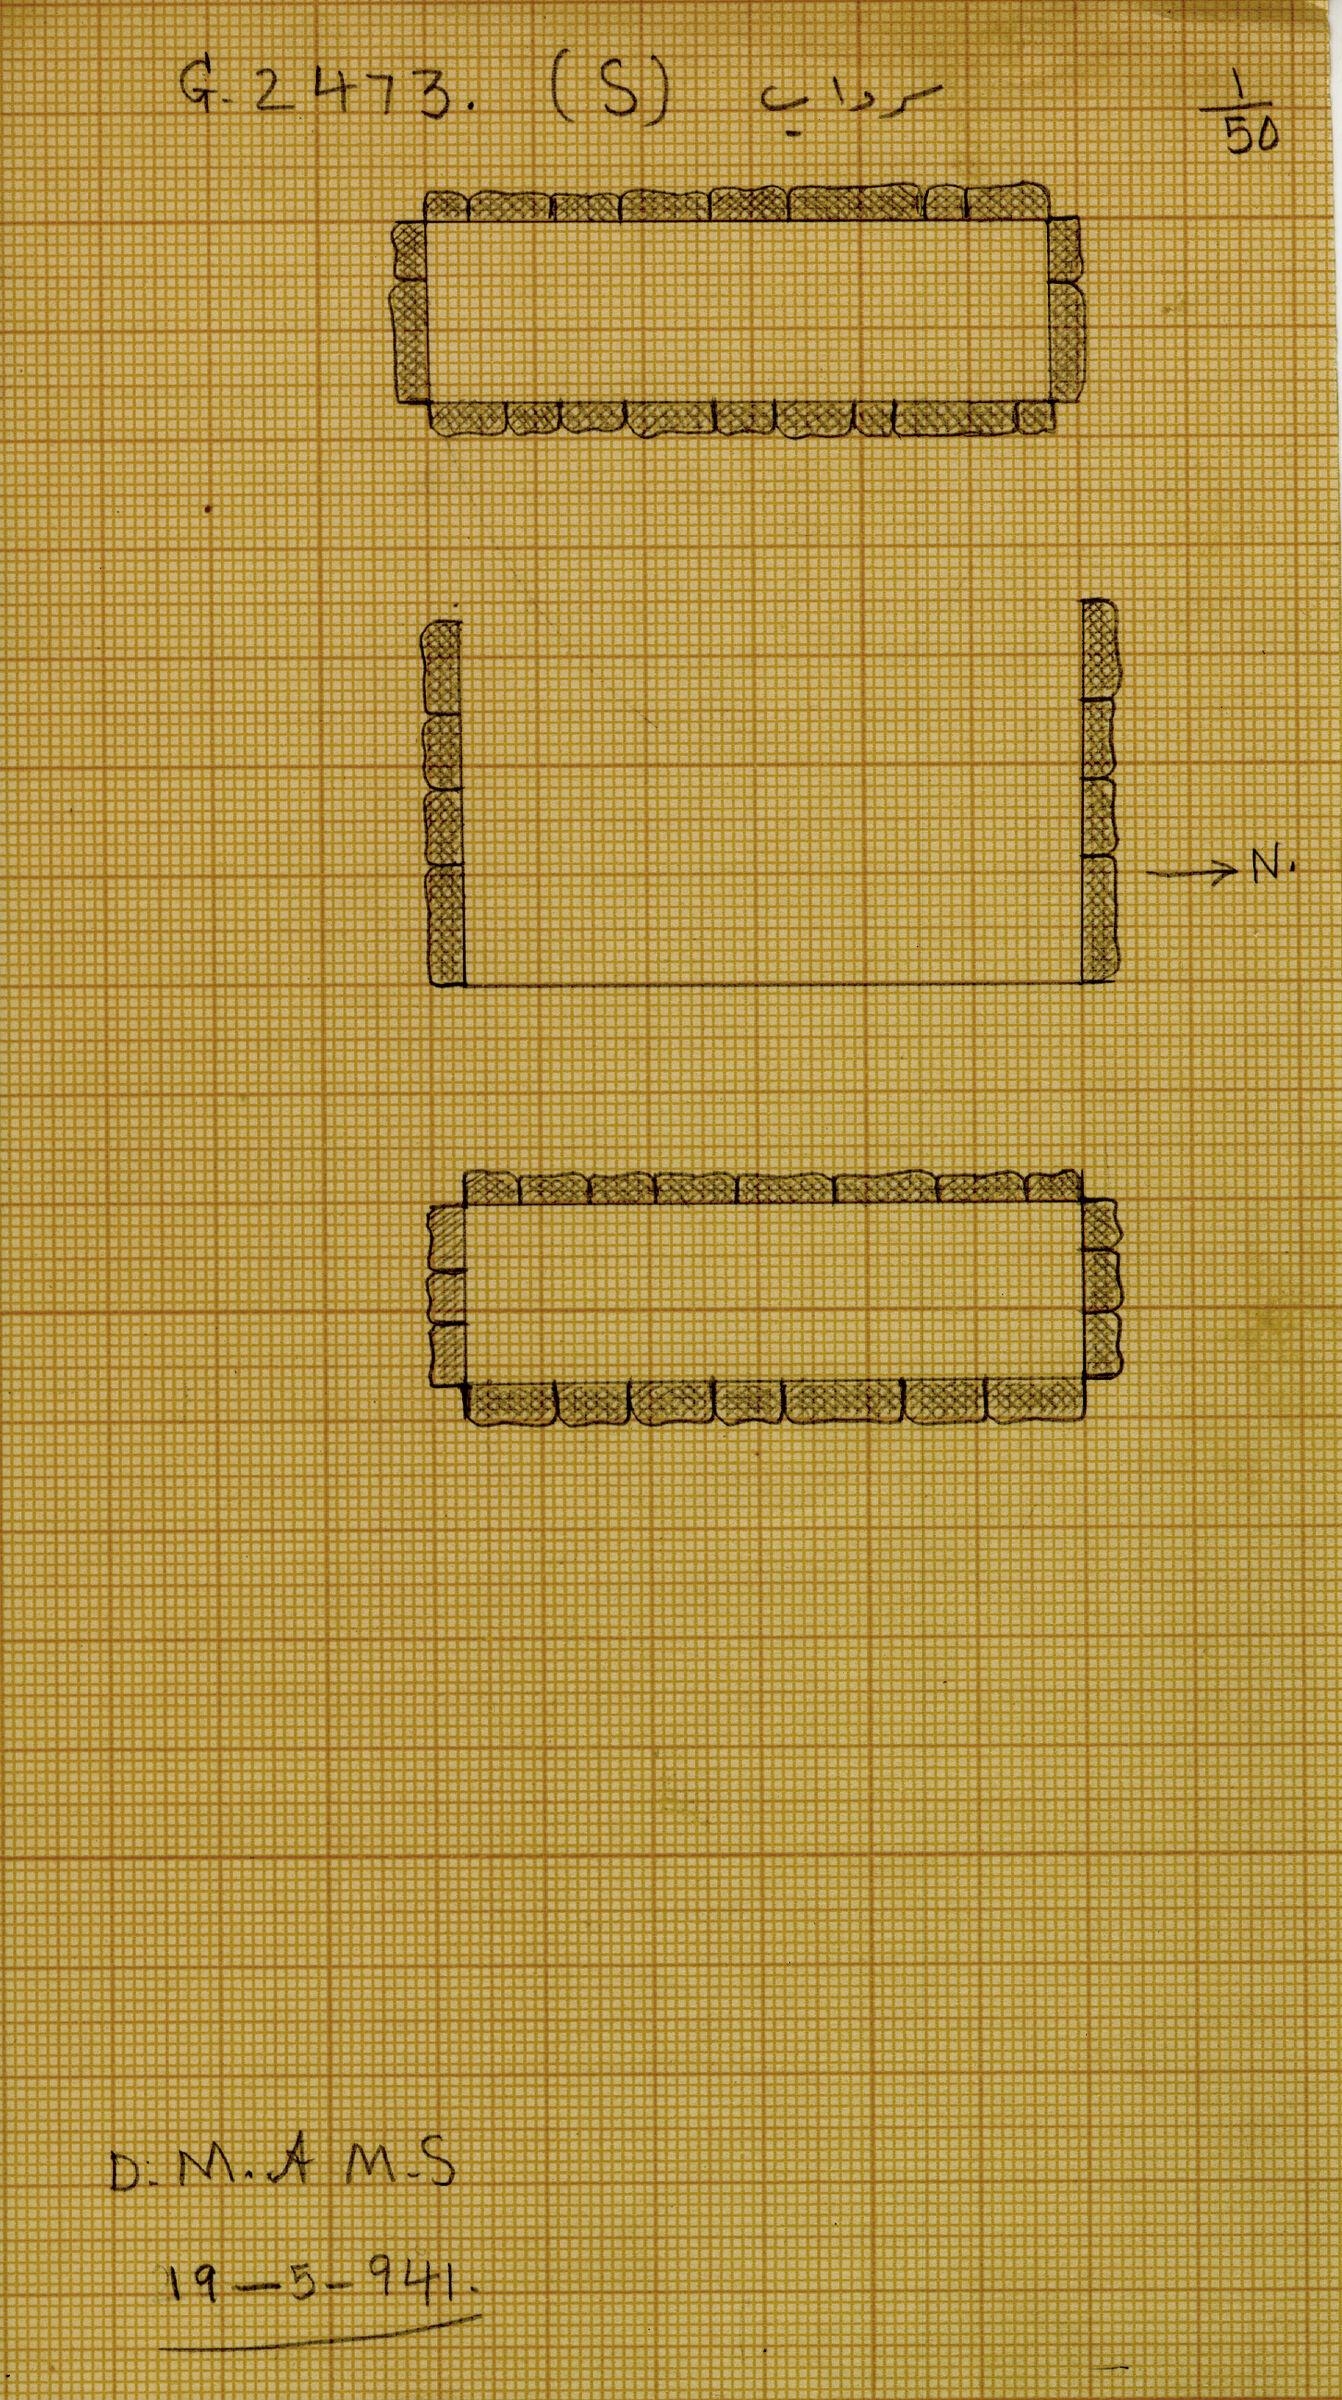 Maps and plans: G 2473, Serdab